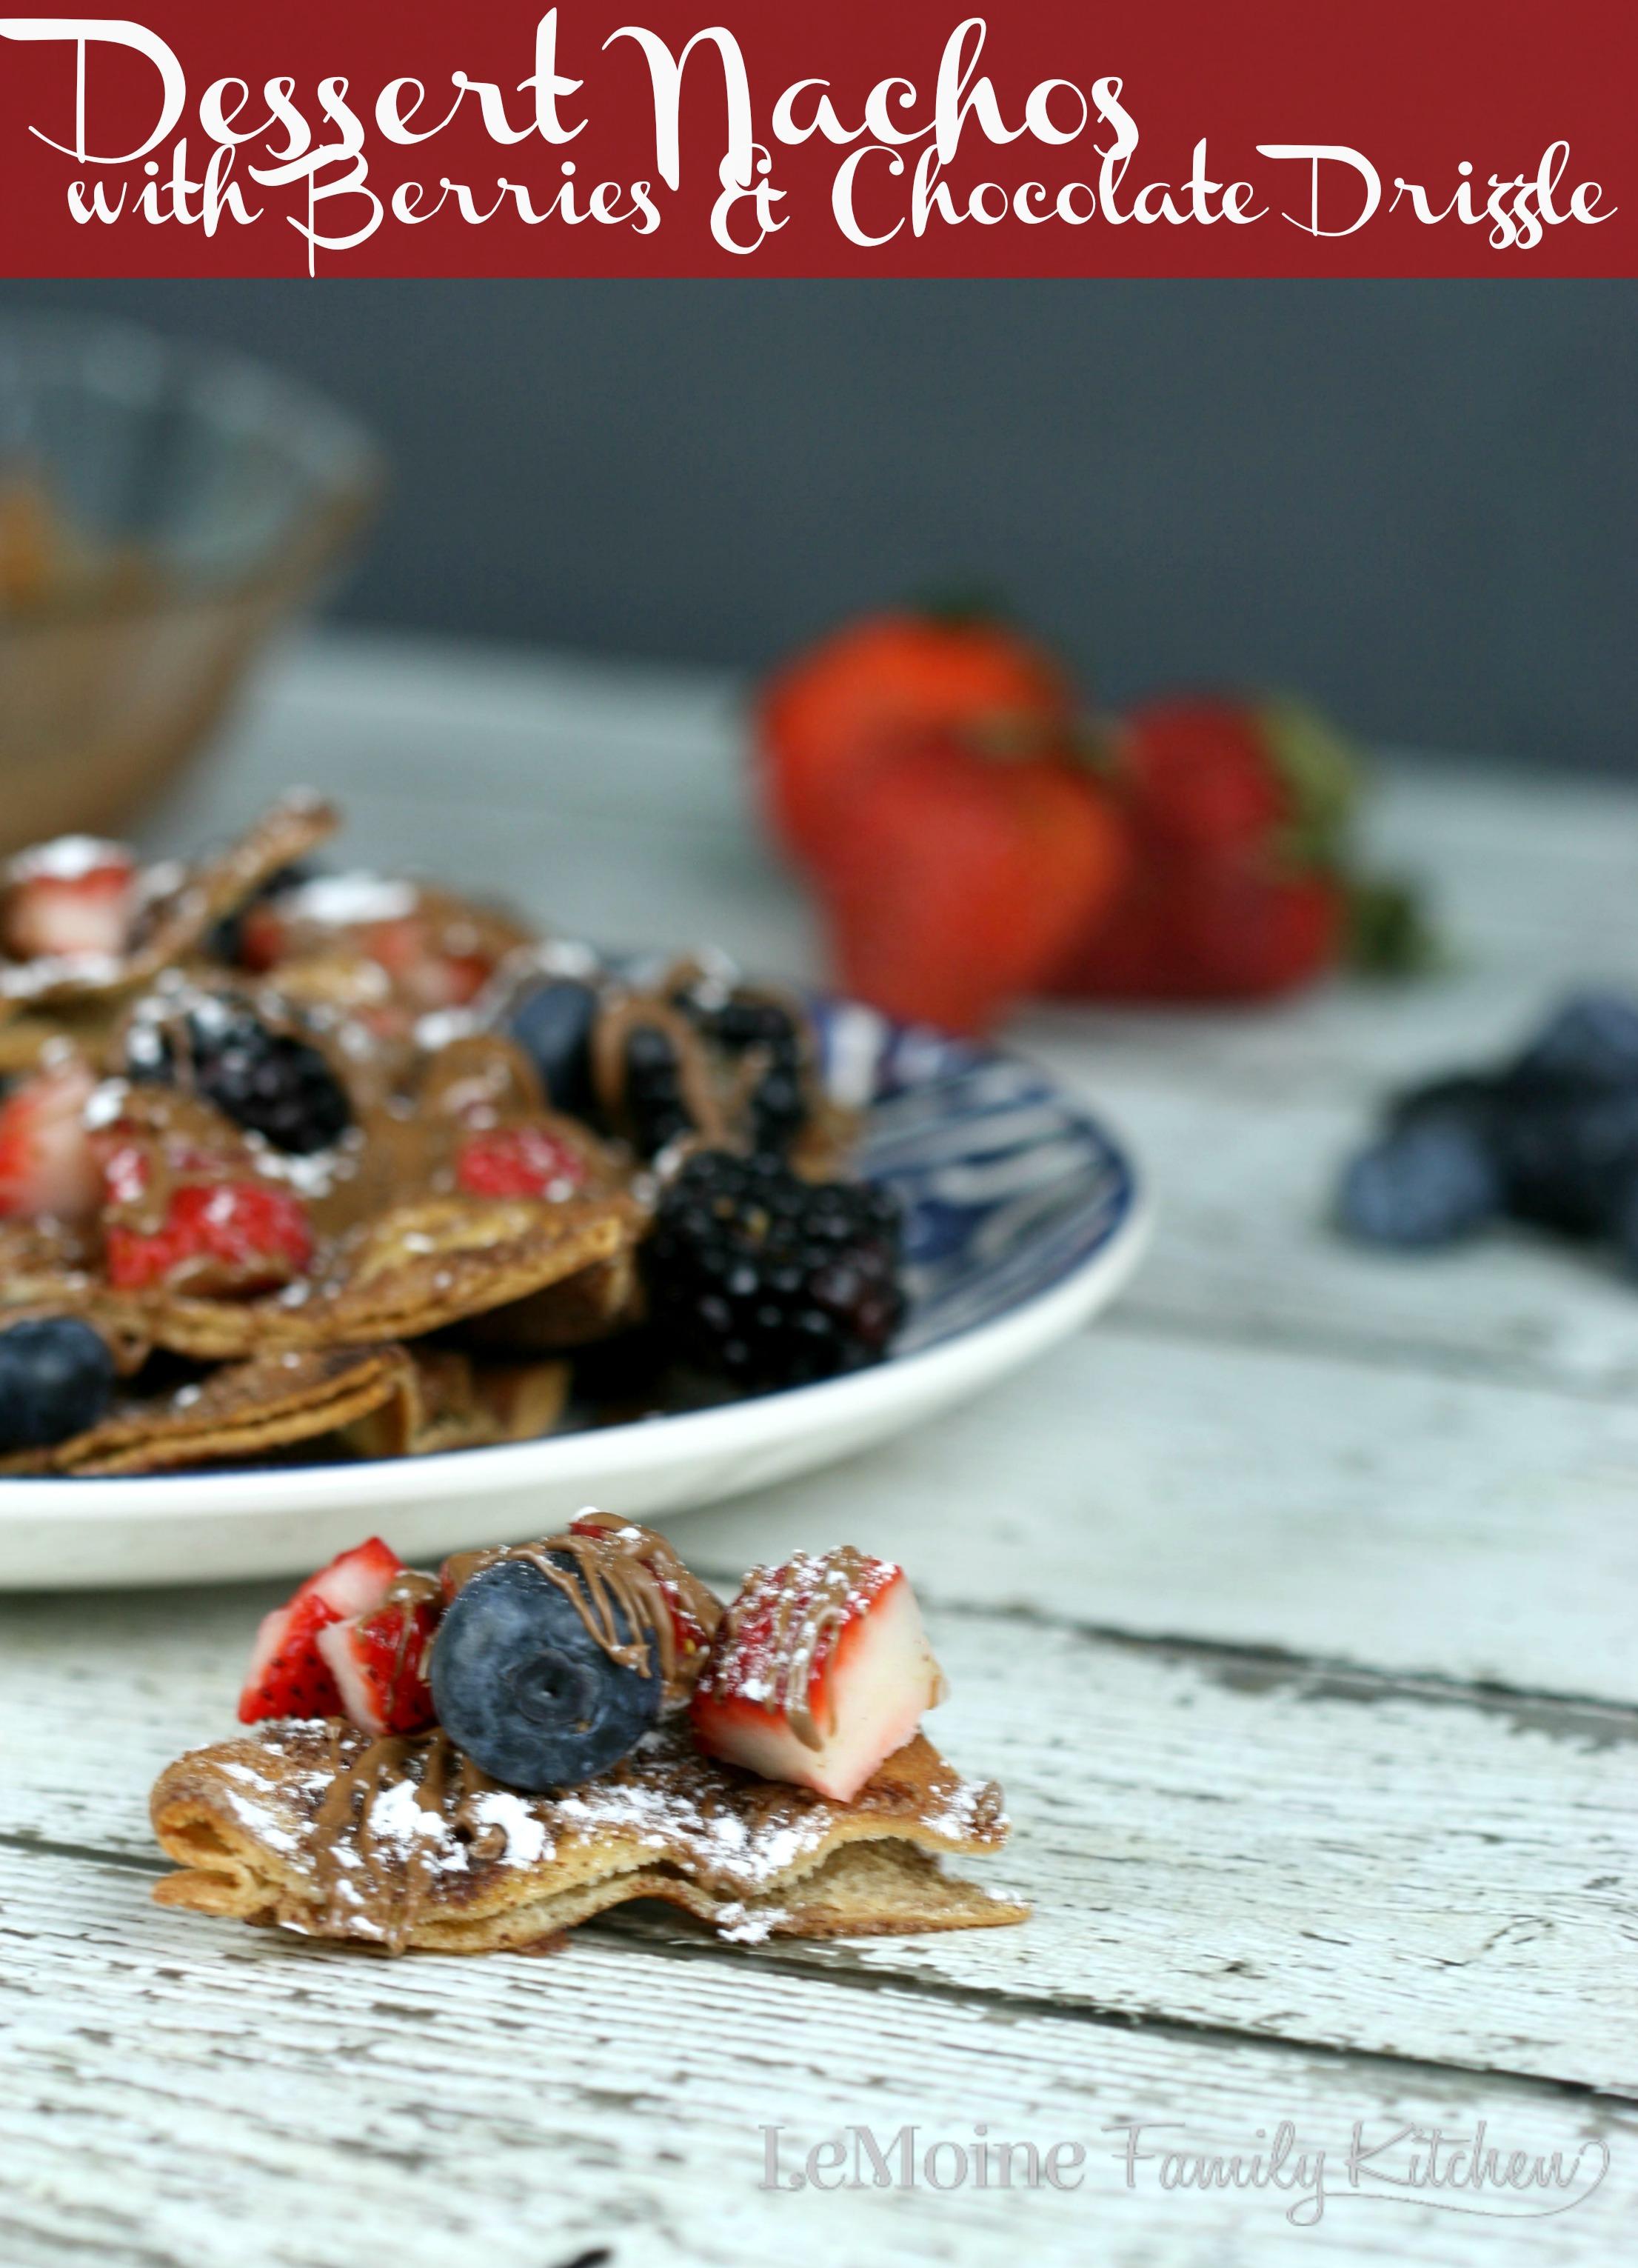 Dessert Nachos With Berries Chocolate Drizzle Lemoine